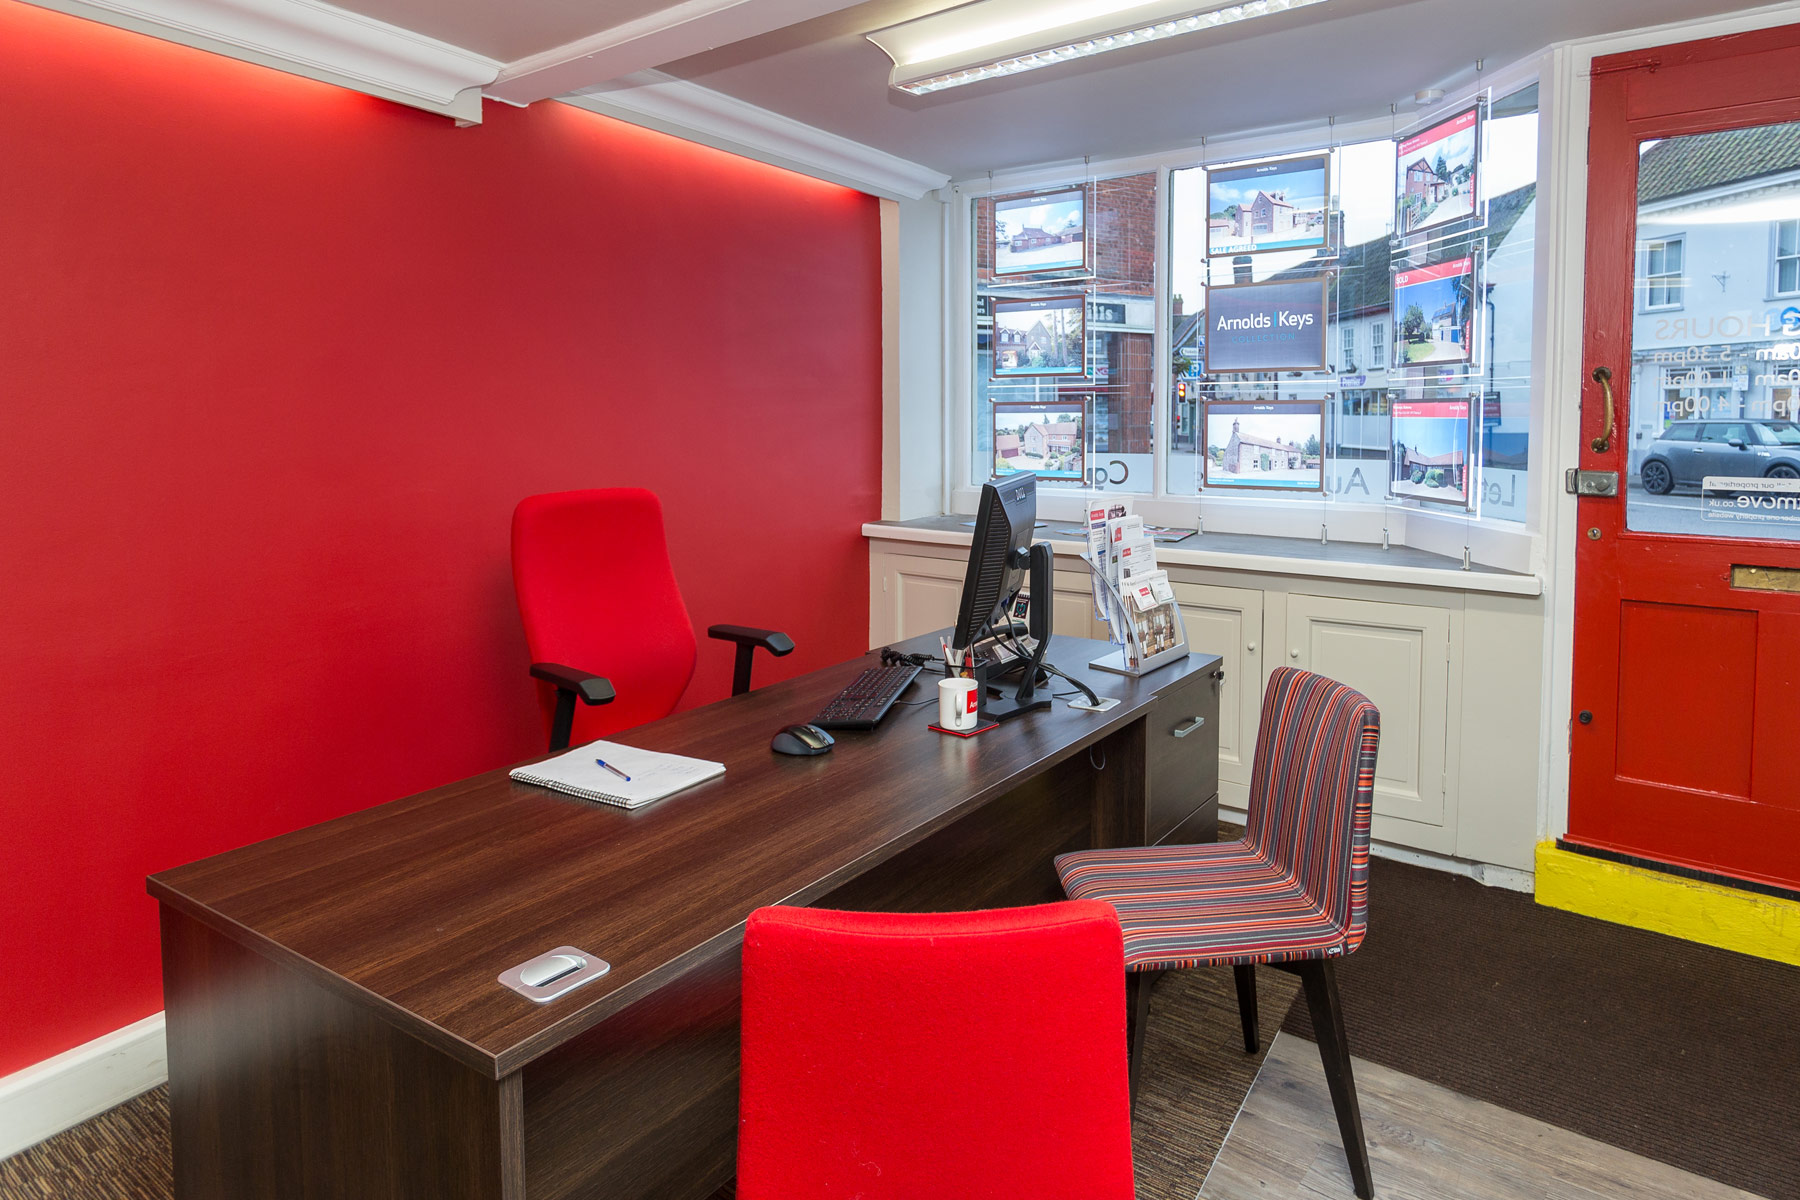 arnold holt office refurbishment